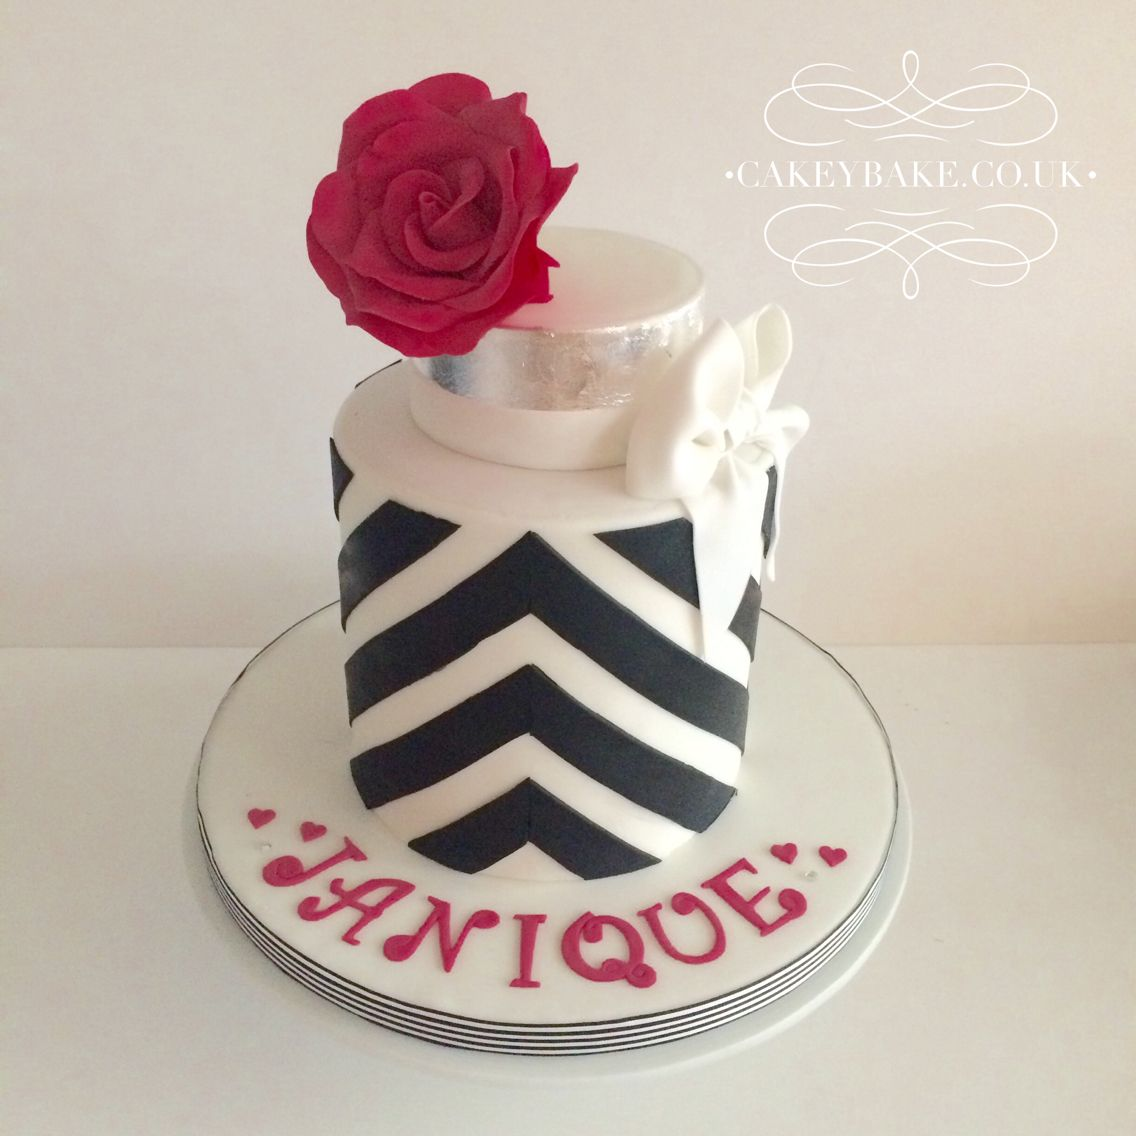 Black and White Chevron Birthday Cake By Kirsty Low wwwcakeybake